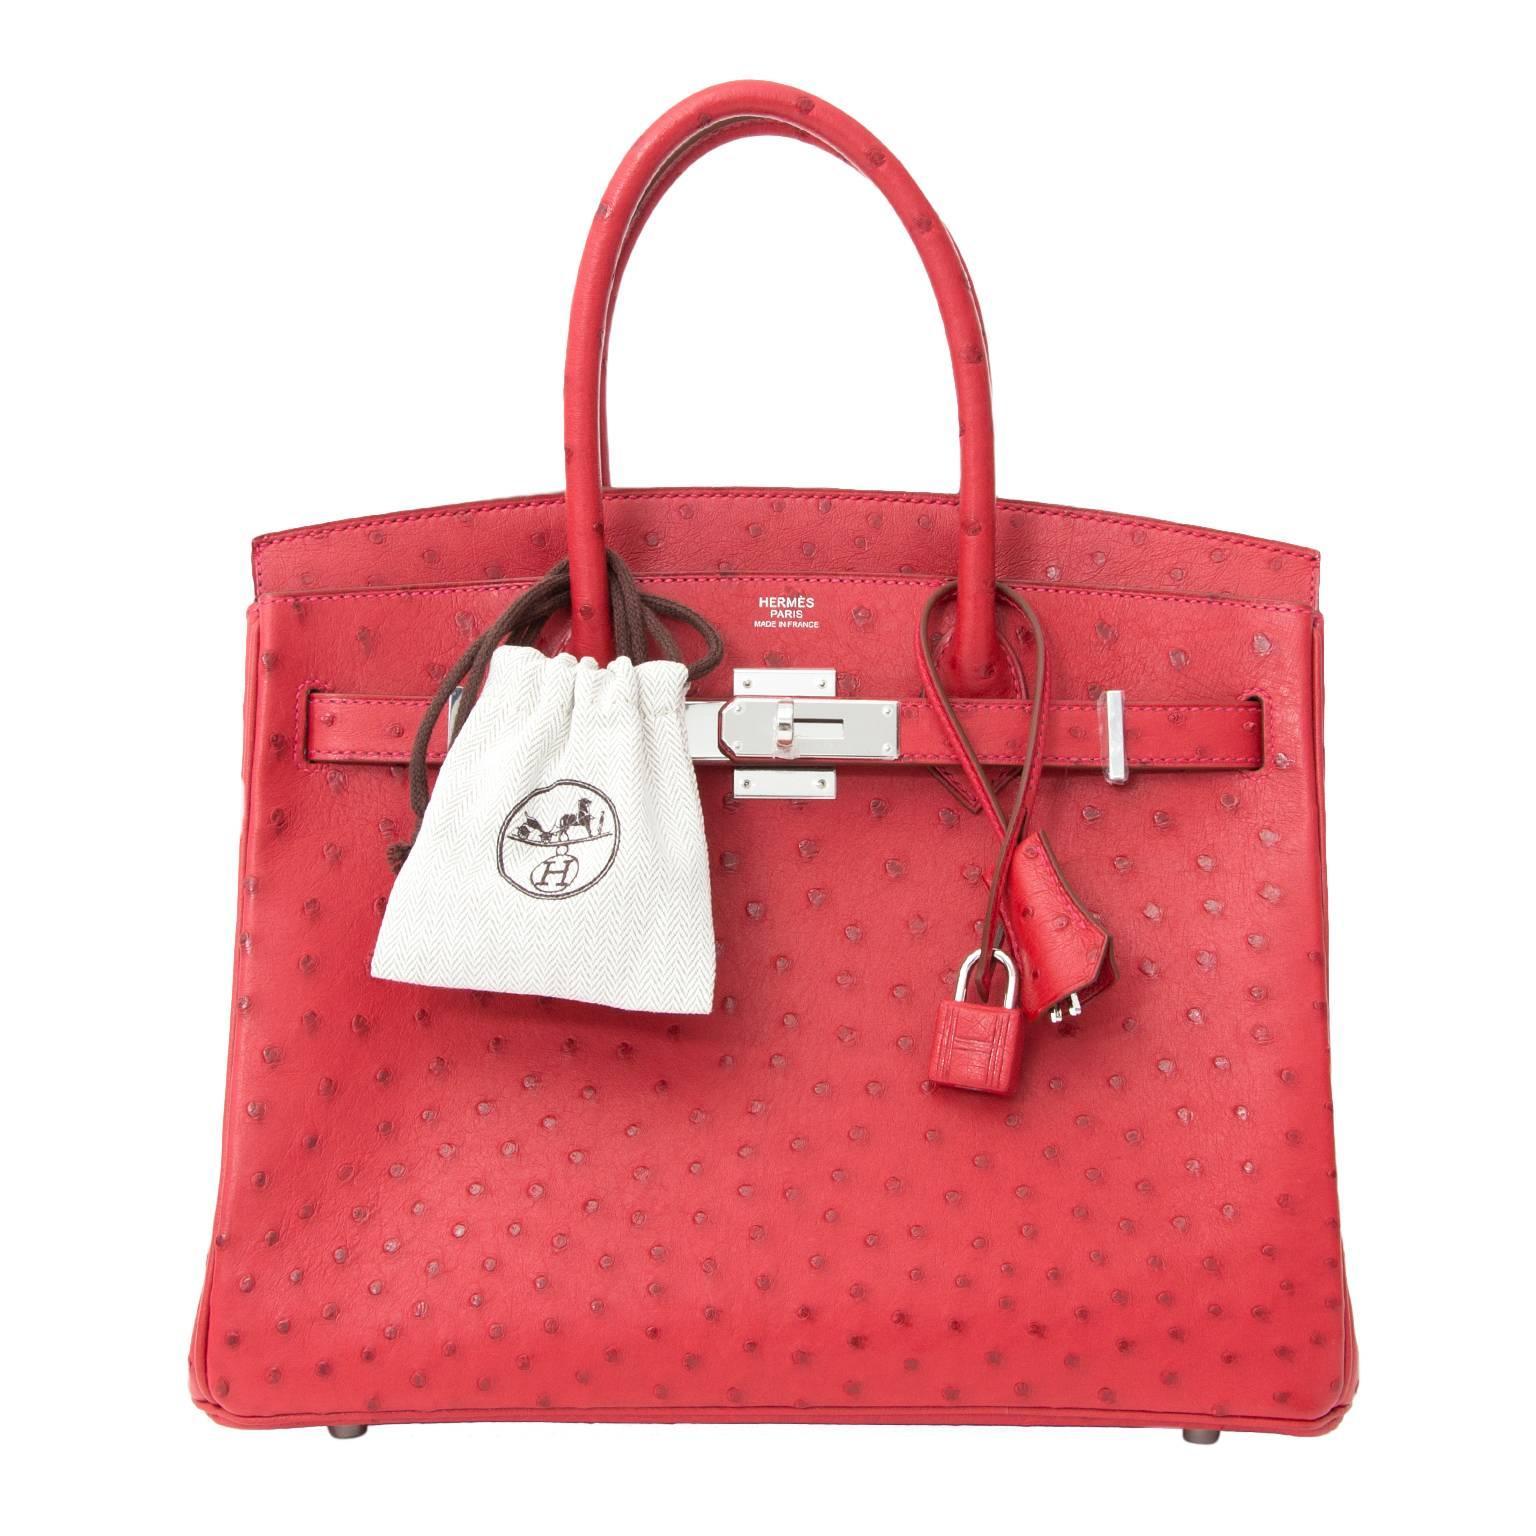 Hermes Birkin Ostrich Bags - 21 For Sale on 1stdibs 546d13fadc413